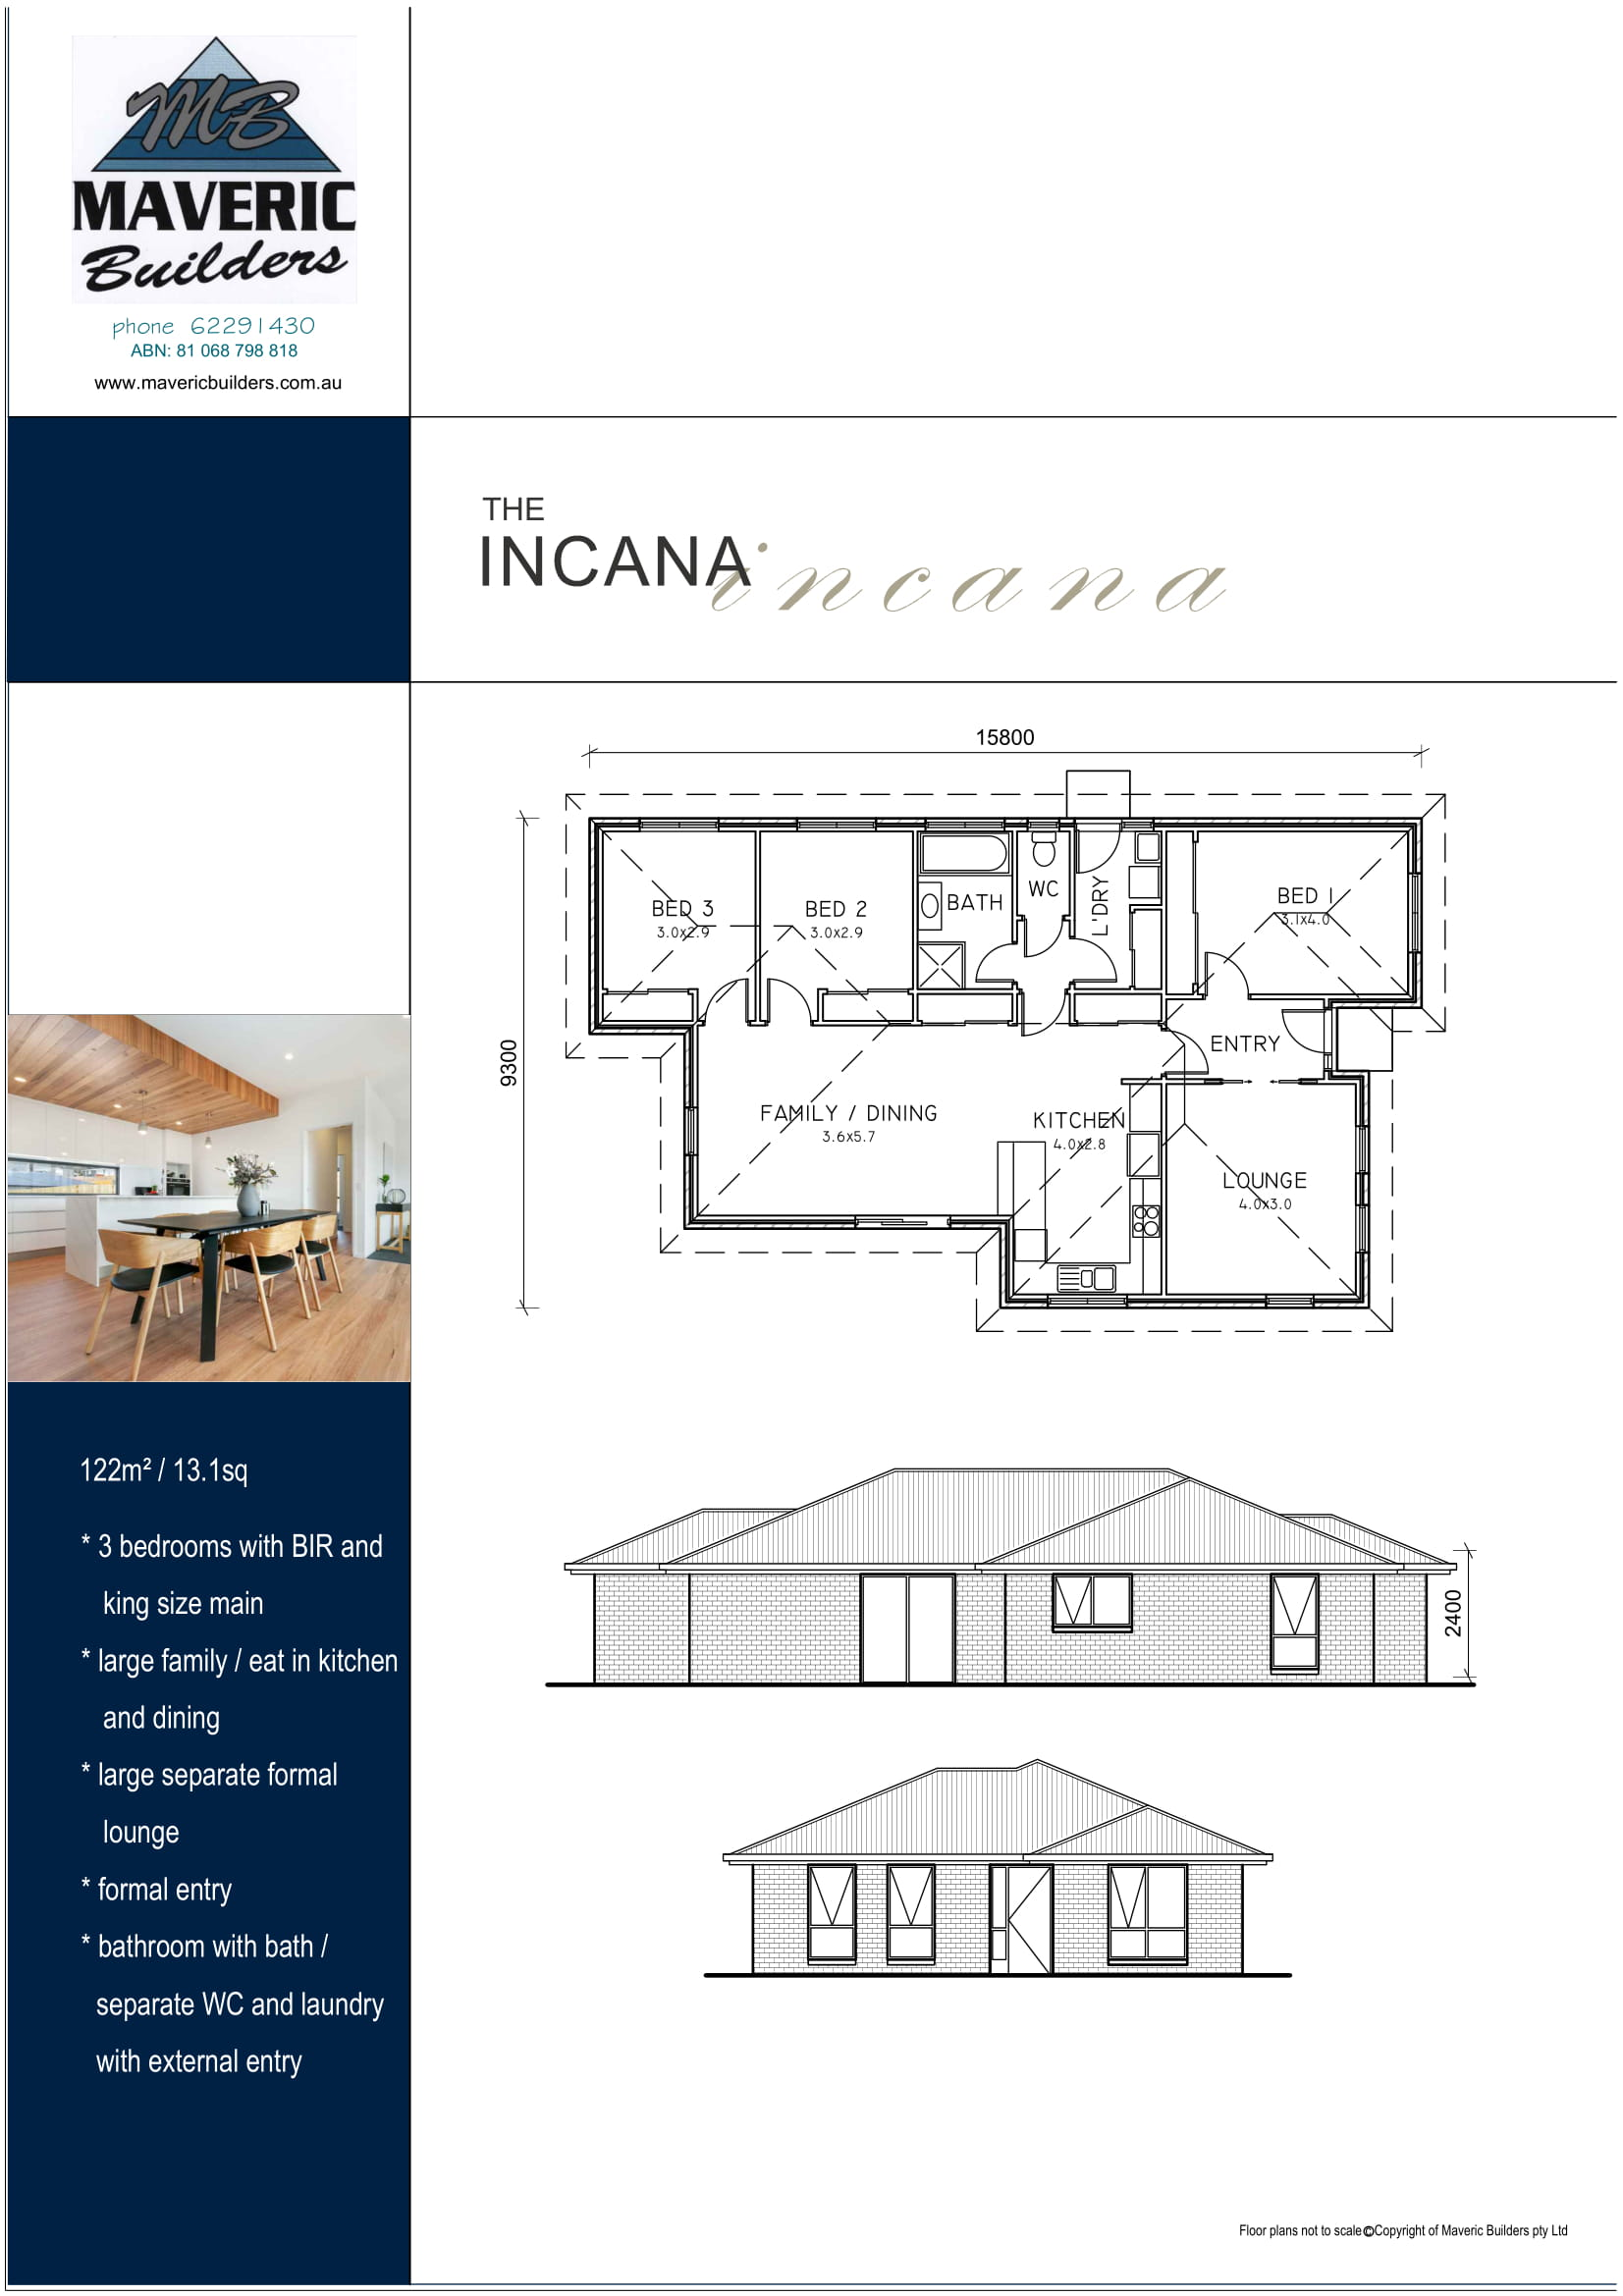 A4 Brochures 2019 01 - 24-07.jpg